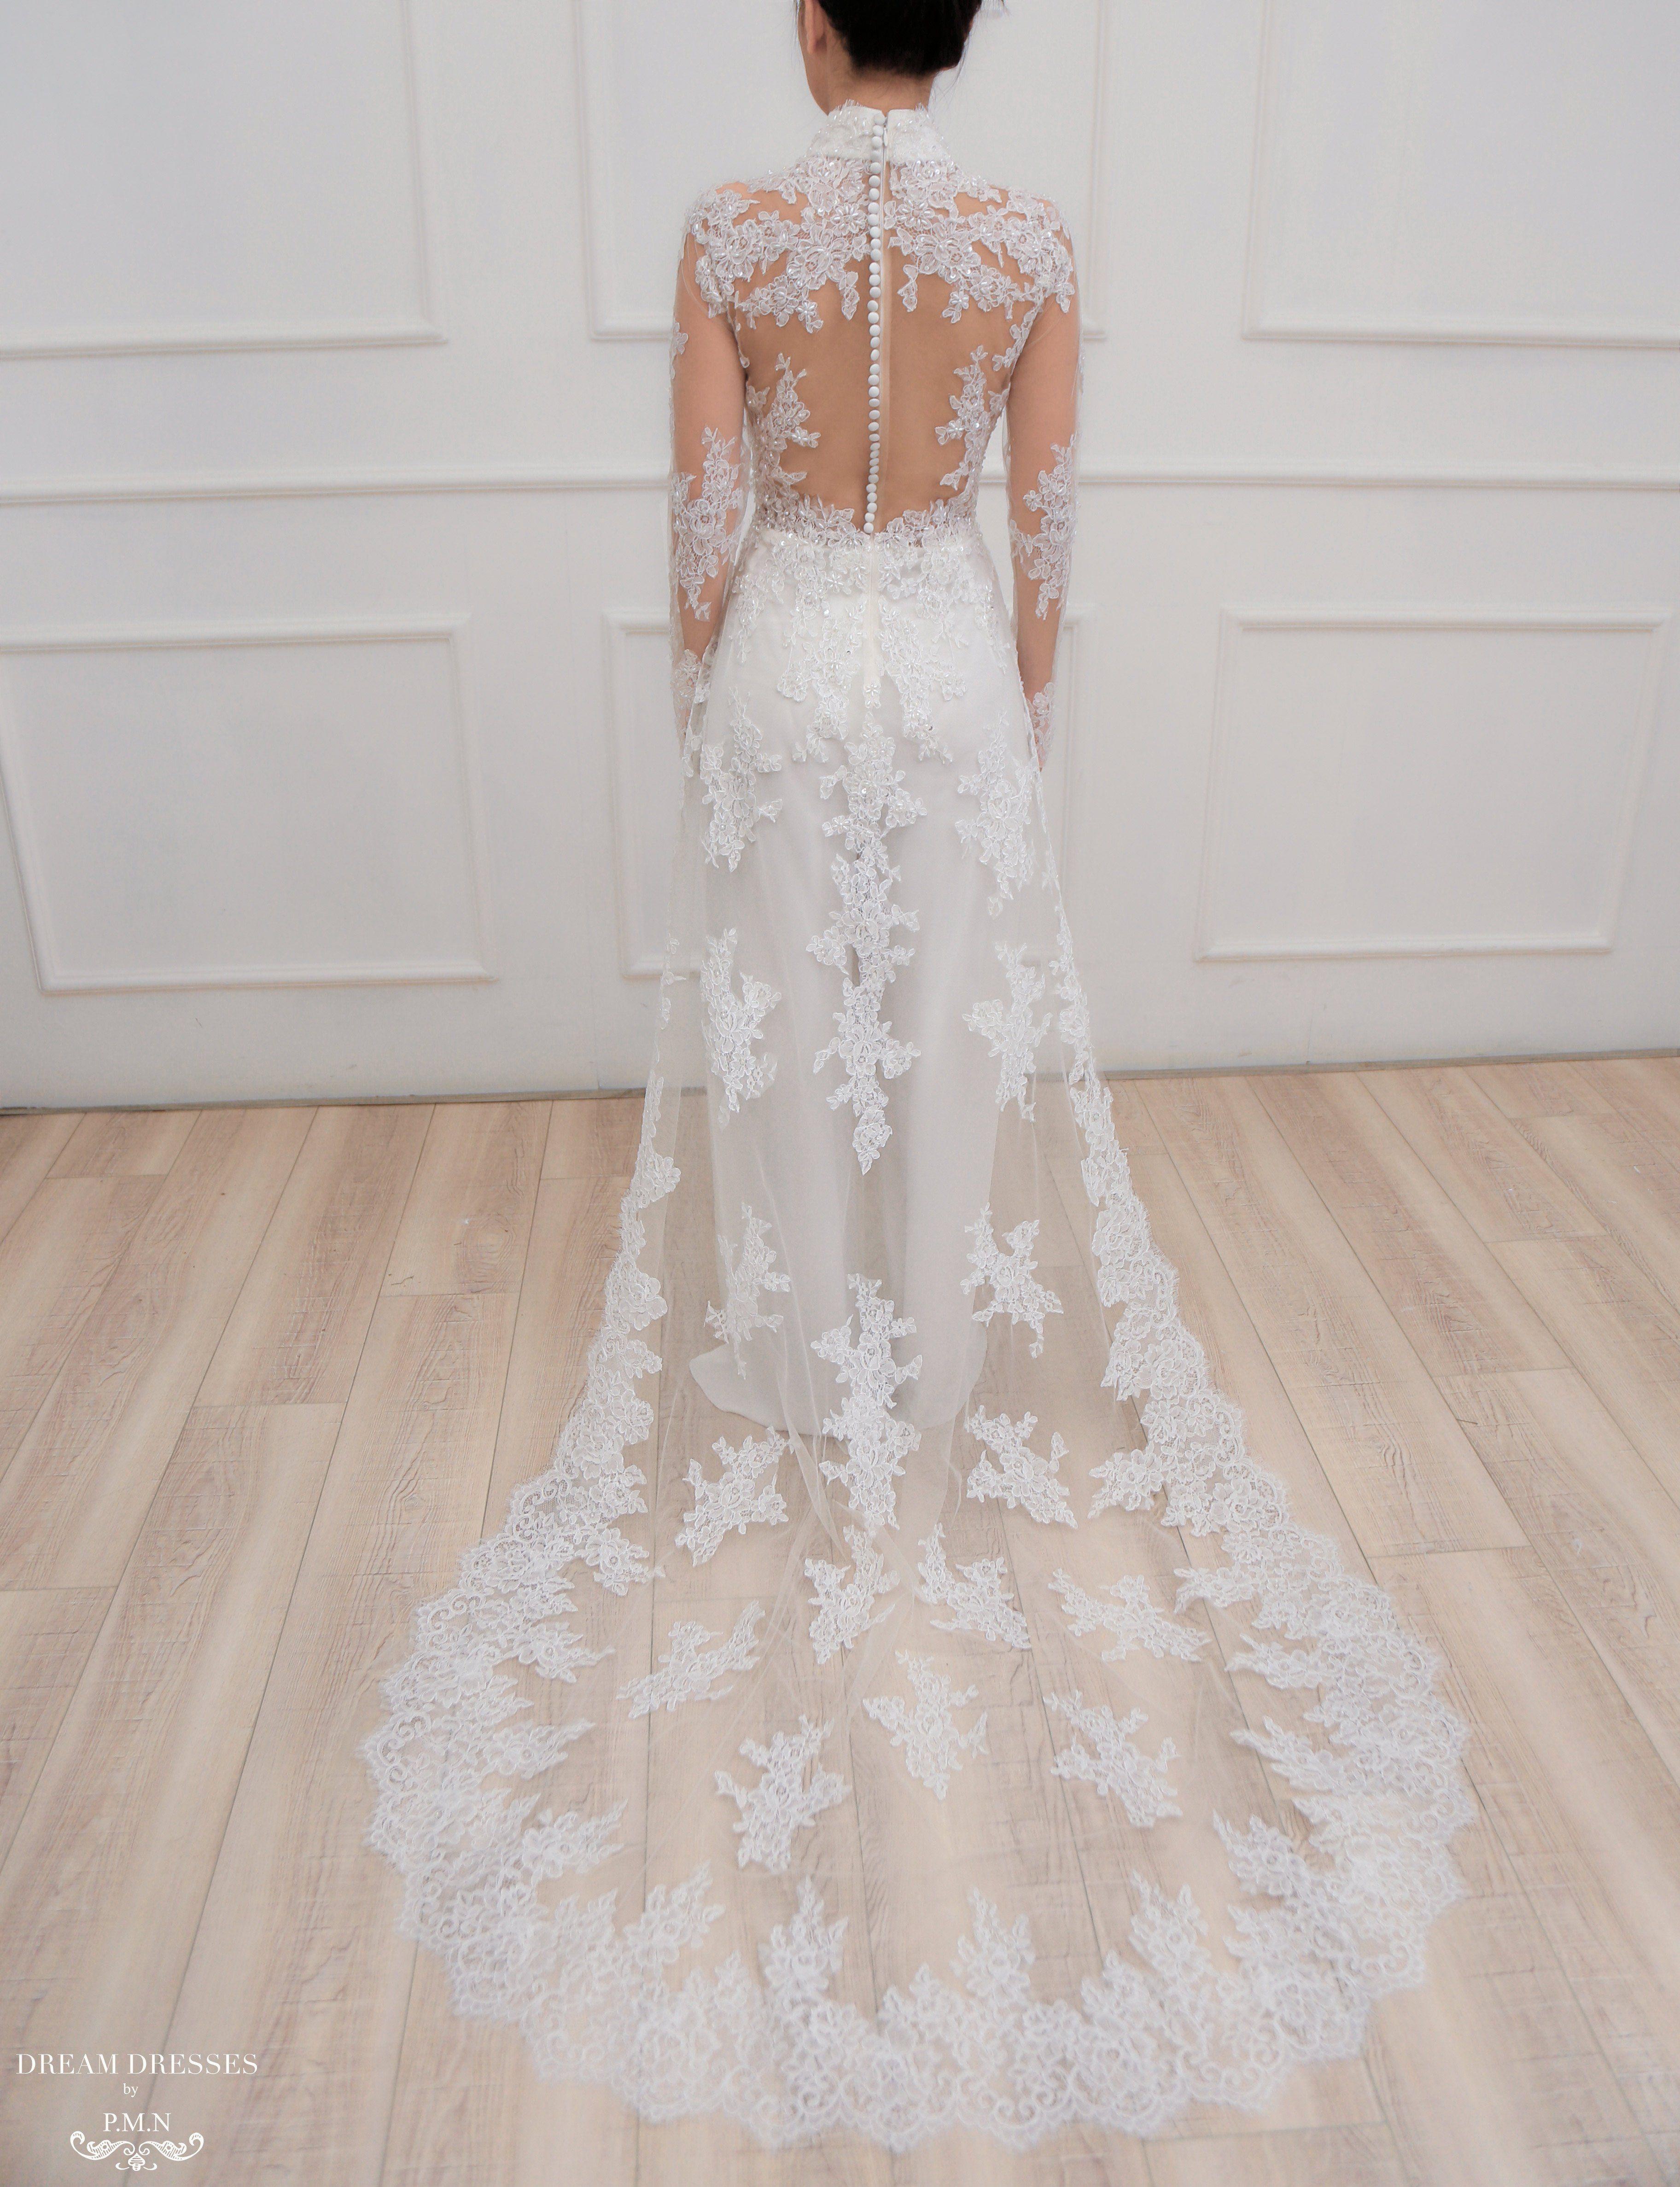 White Ao Dai Modern Vietnamese Lace Bridal Dress Jenine Dream Dresses By P M N Bridal Dresses Lace Vietnamese Wedding Dress Bridal Lace